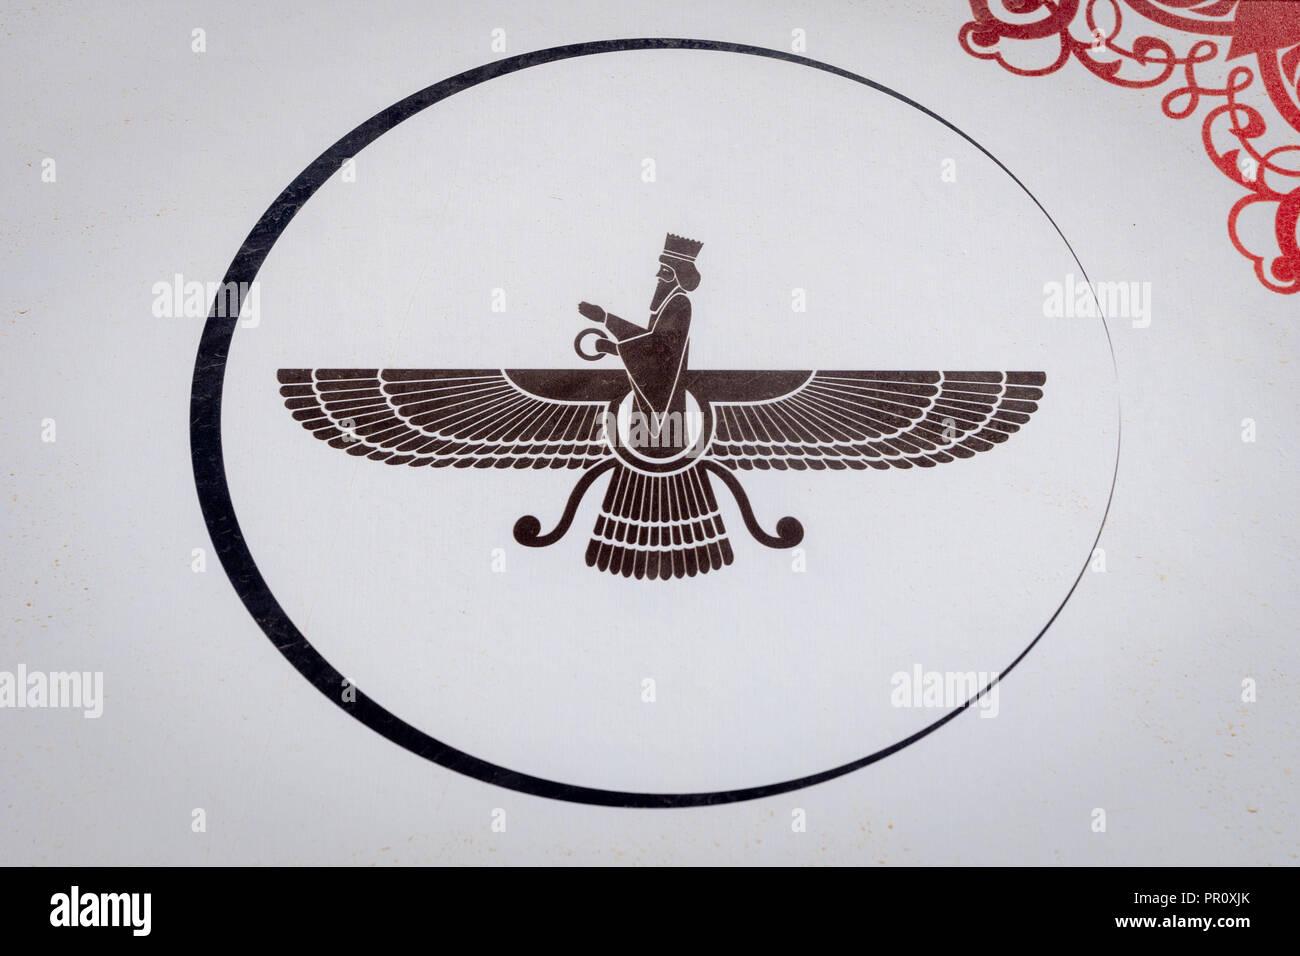 Zoroastrianism Fire Stock Photos Zoroastrianism Fire Stock Images